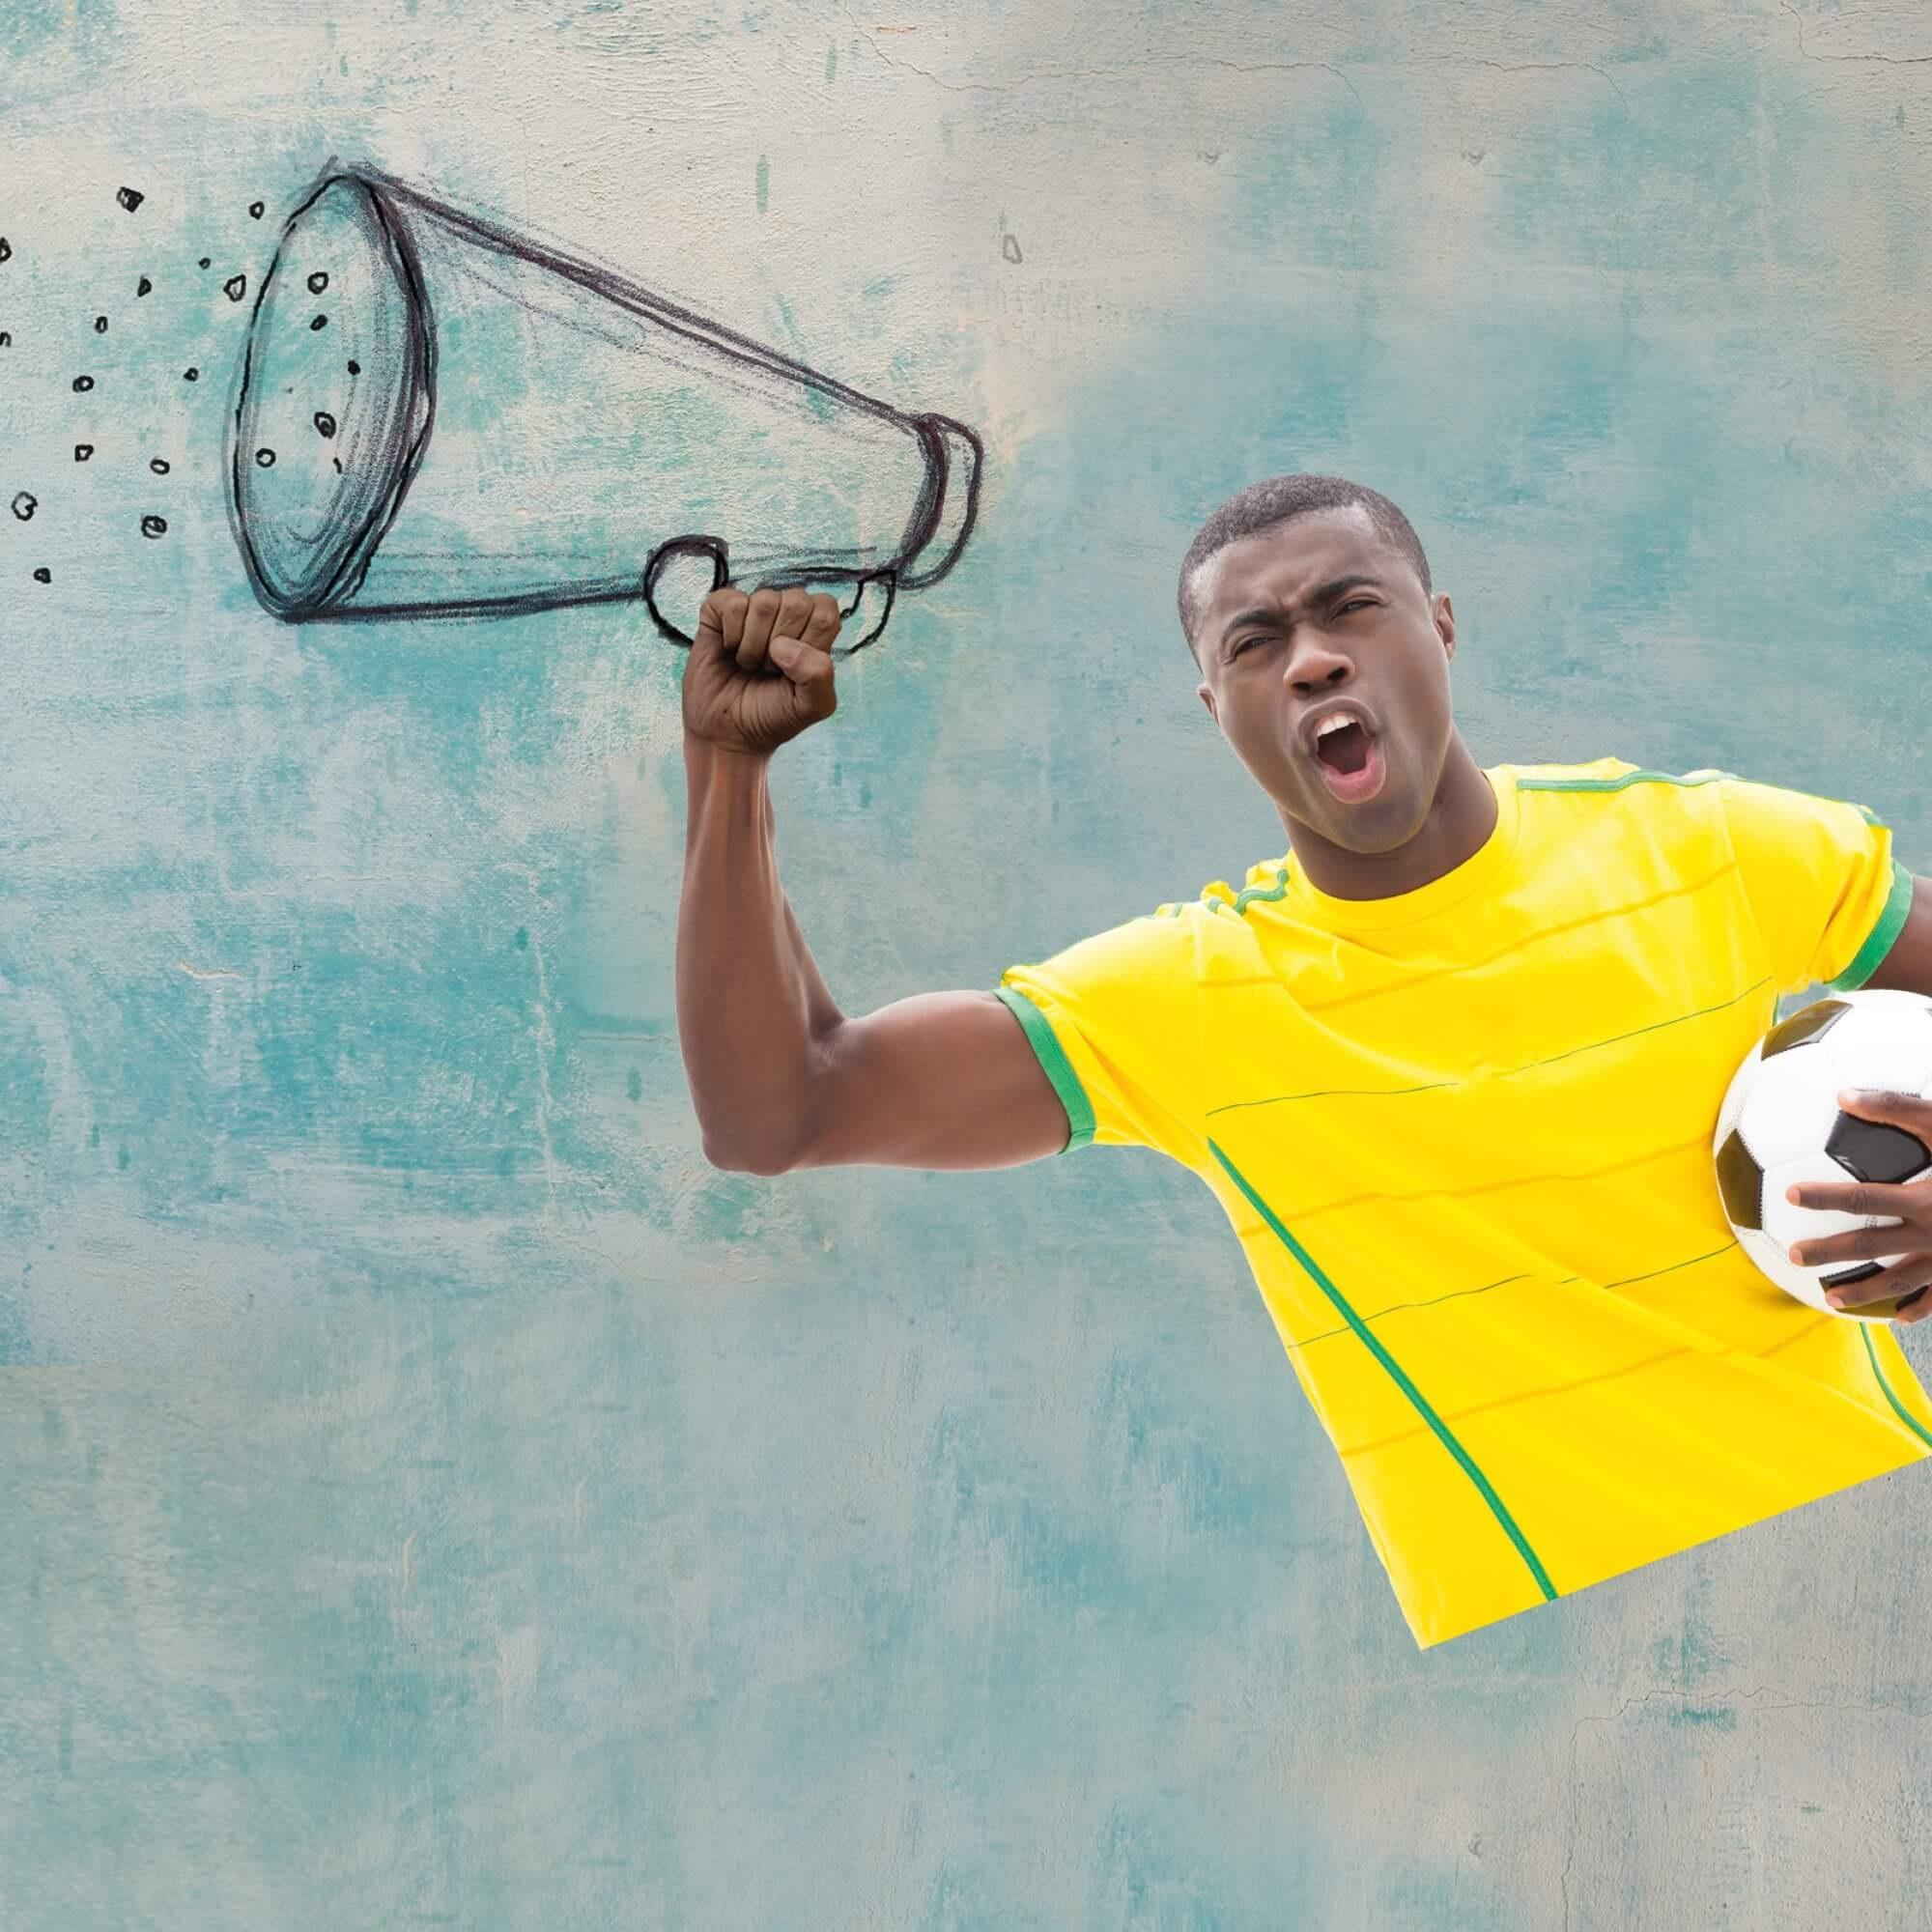 Sport player using megaphone to talk